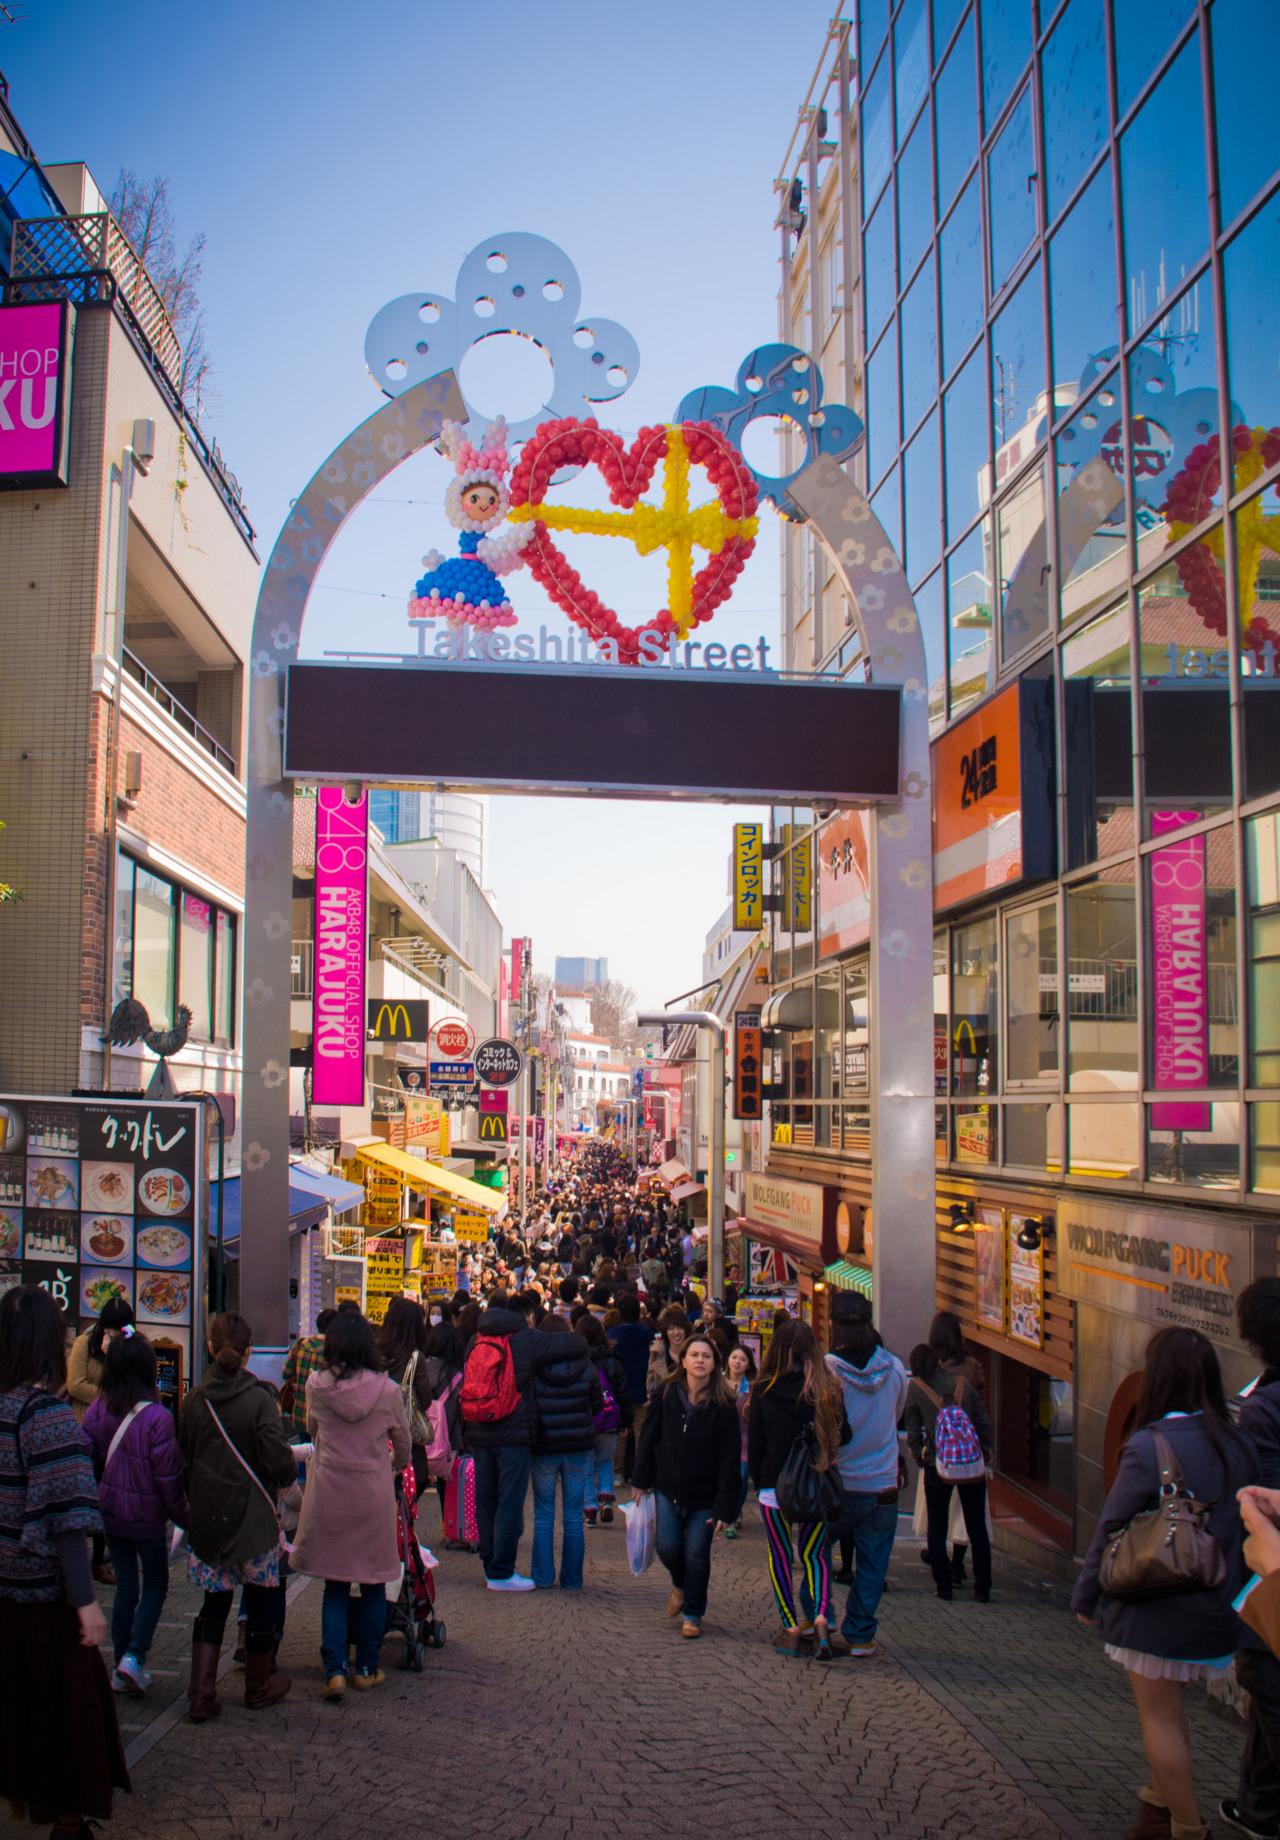 The main shopping road in Harajuku, Takeshita Street.